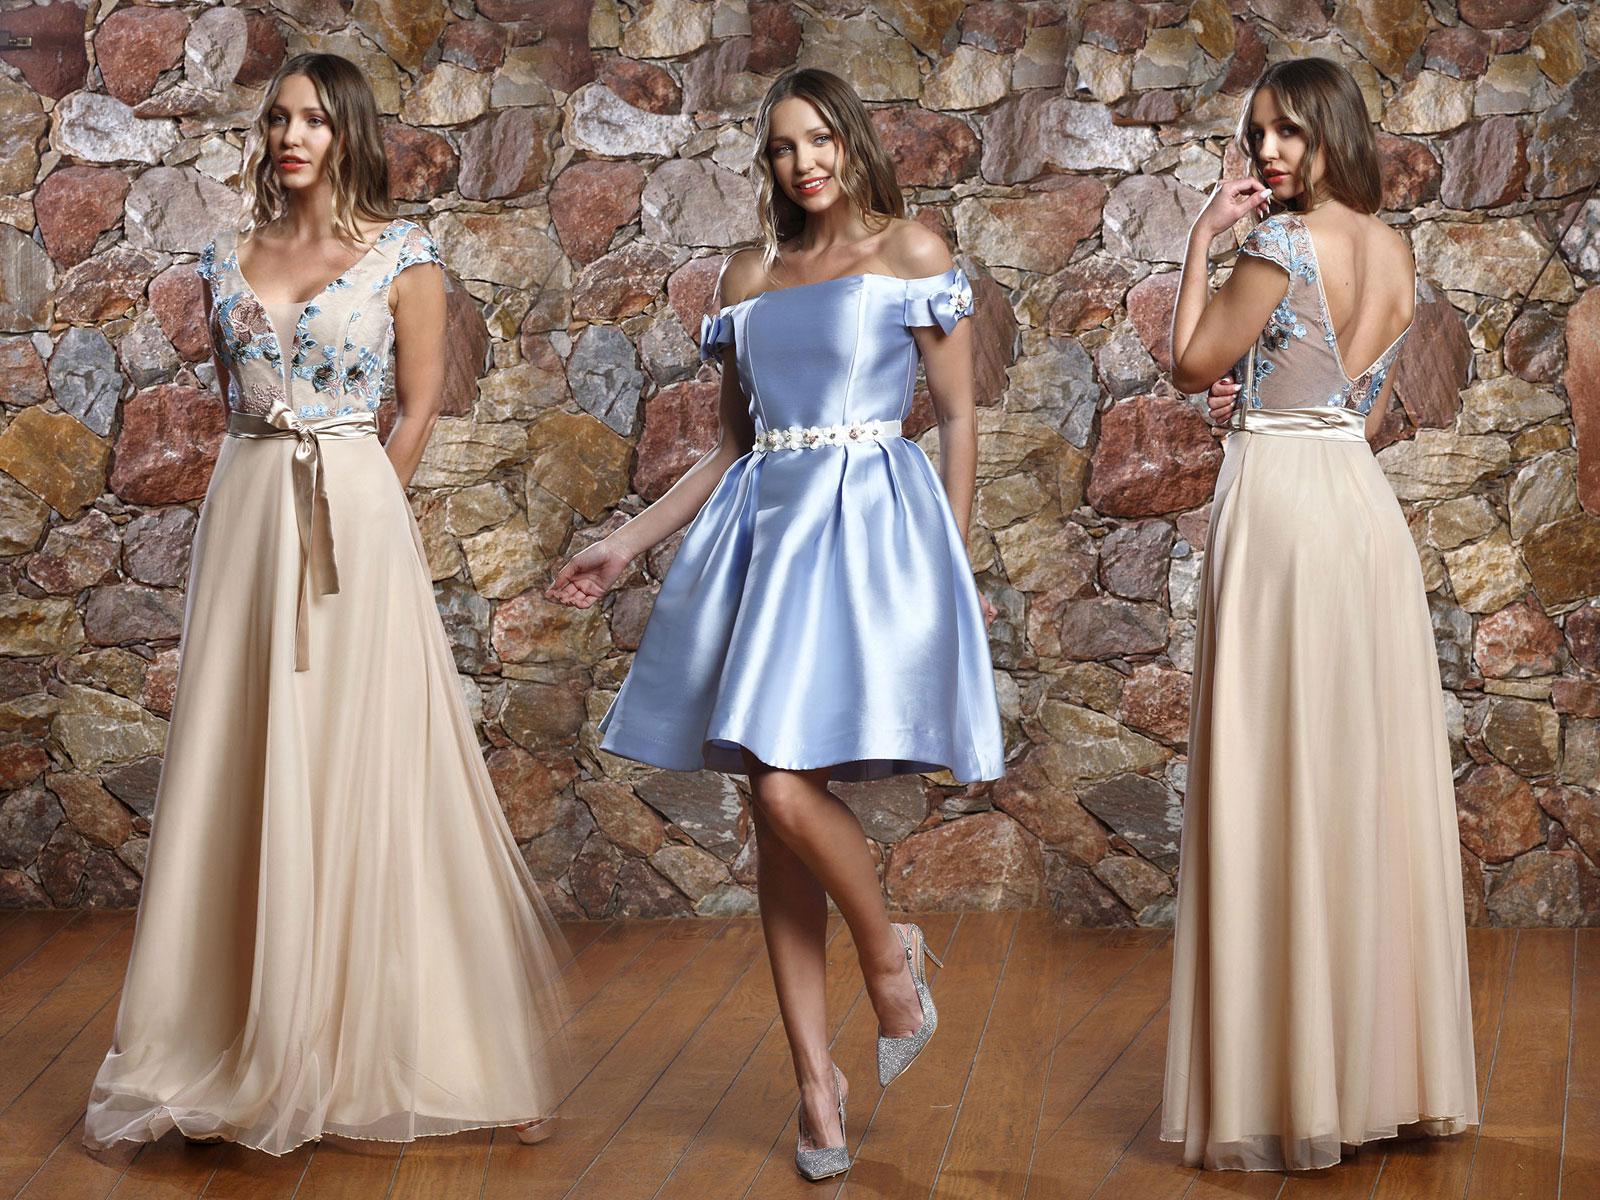 STRASS φορεματα γυναικεια ενδυματα βραδυνα ρουχα καθημερινα πειραια 71f77198468